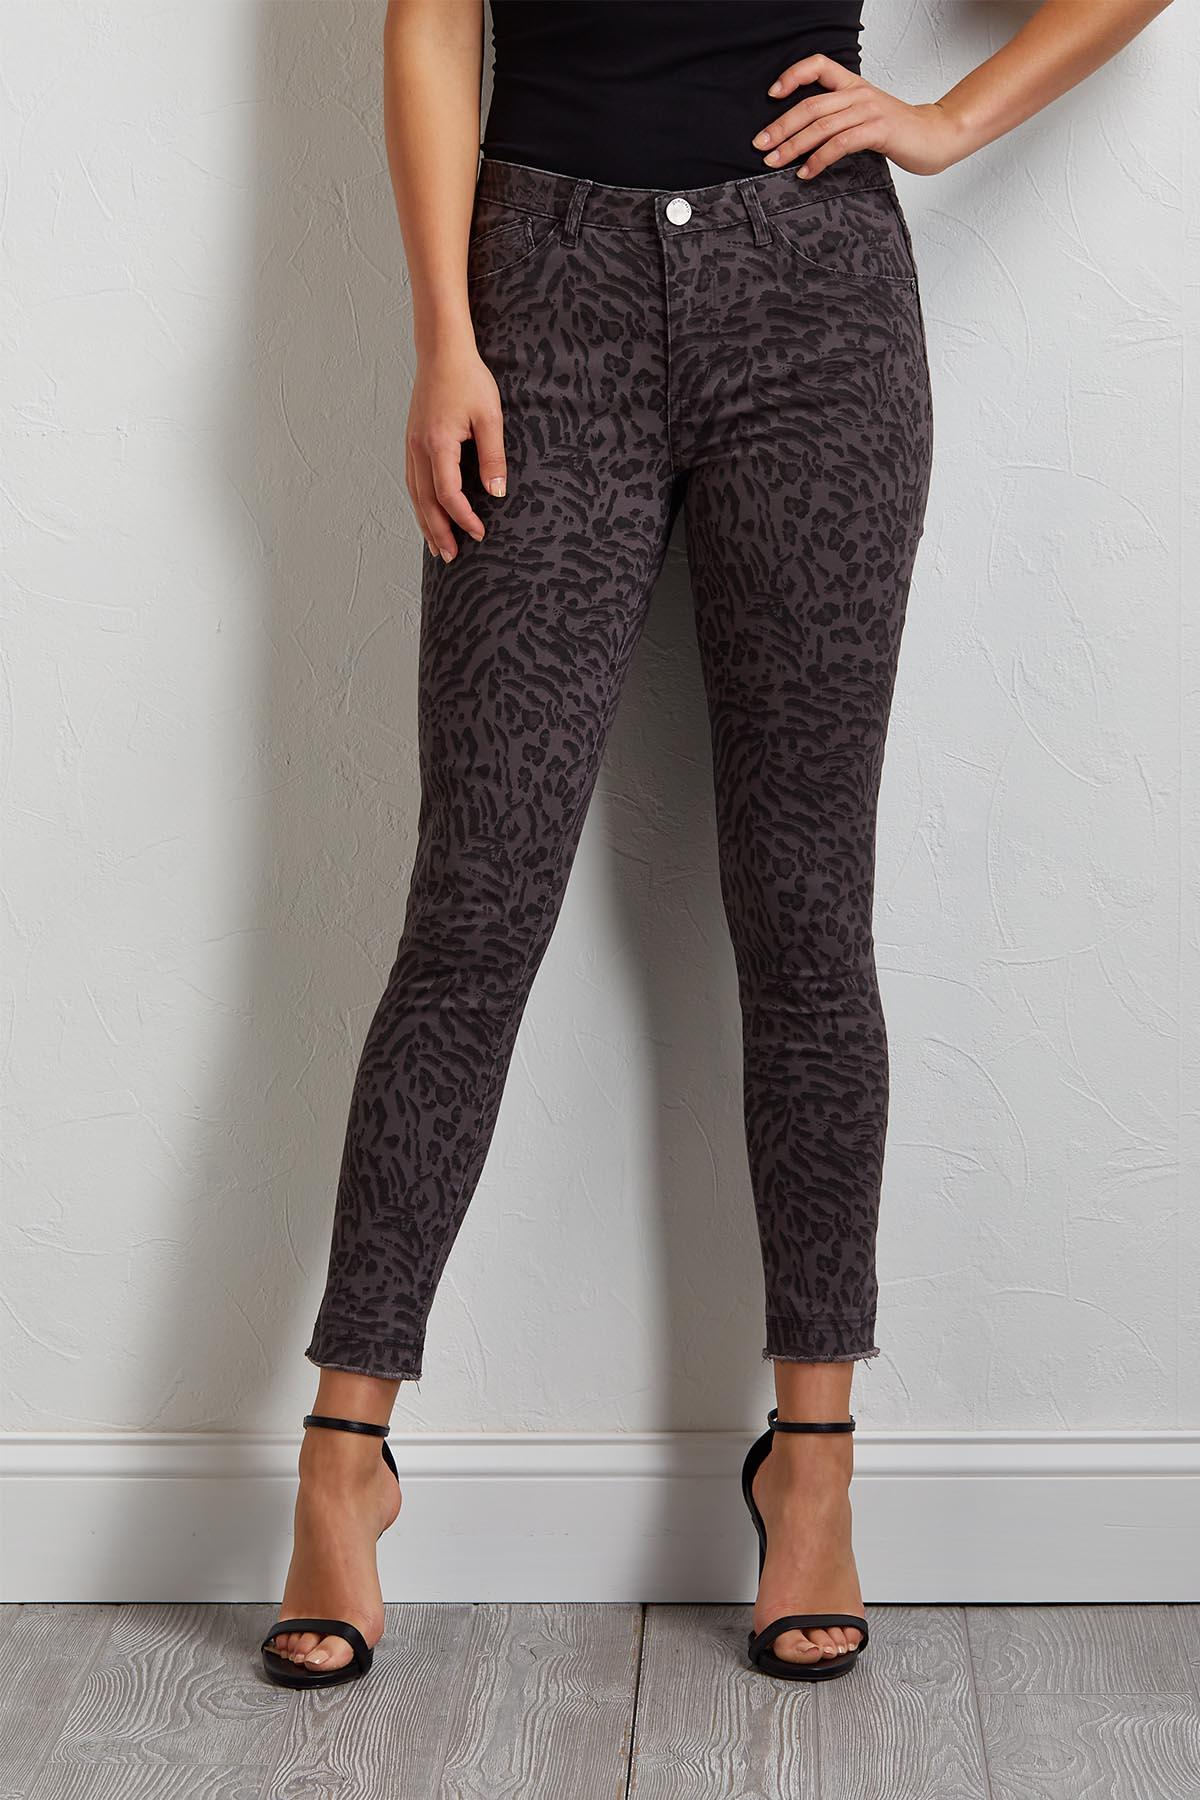 Animal Print Ankle Pants